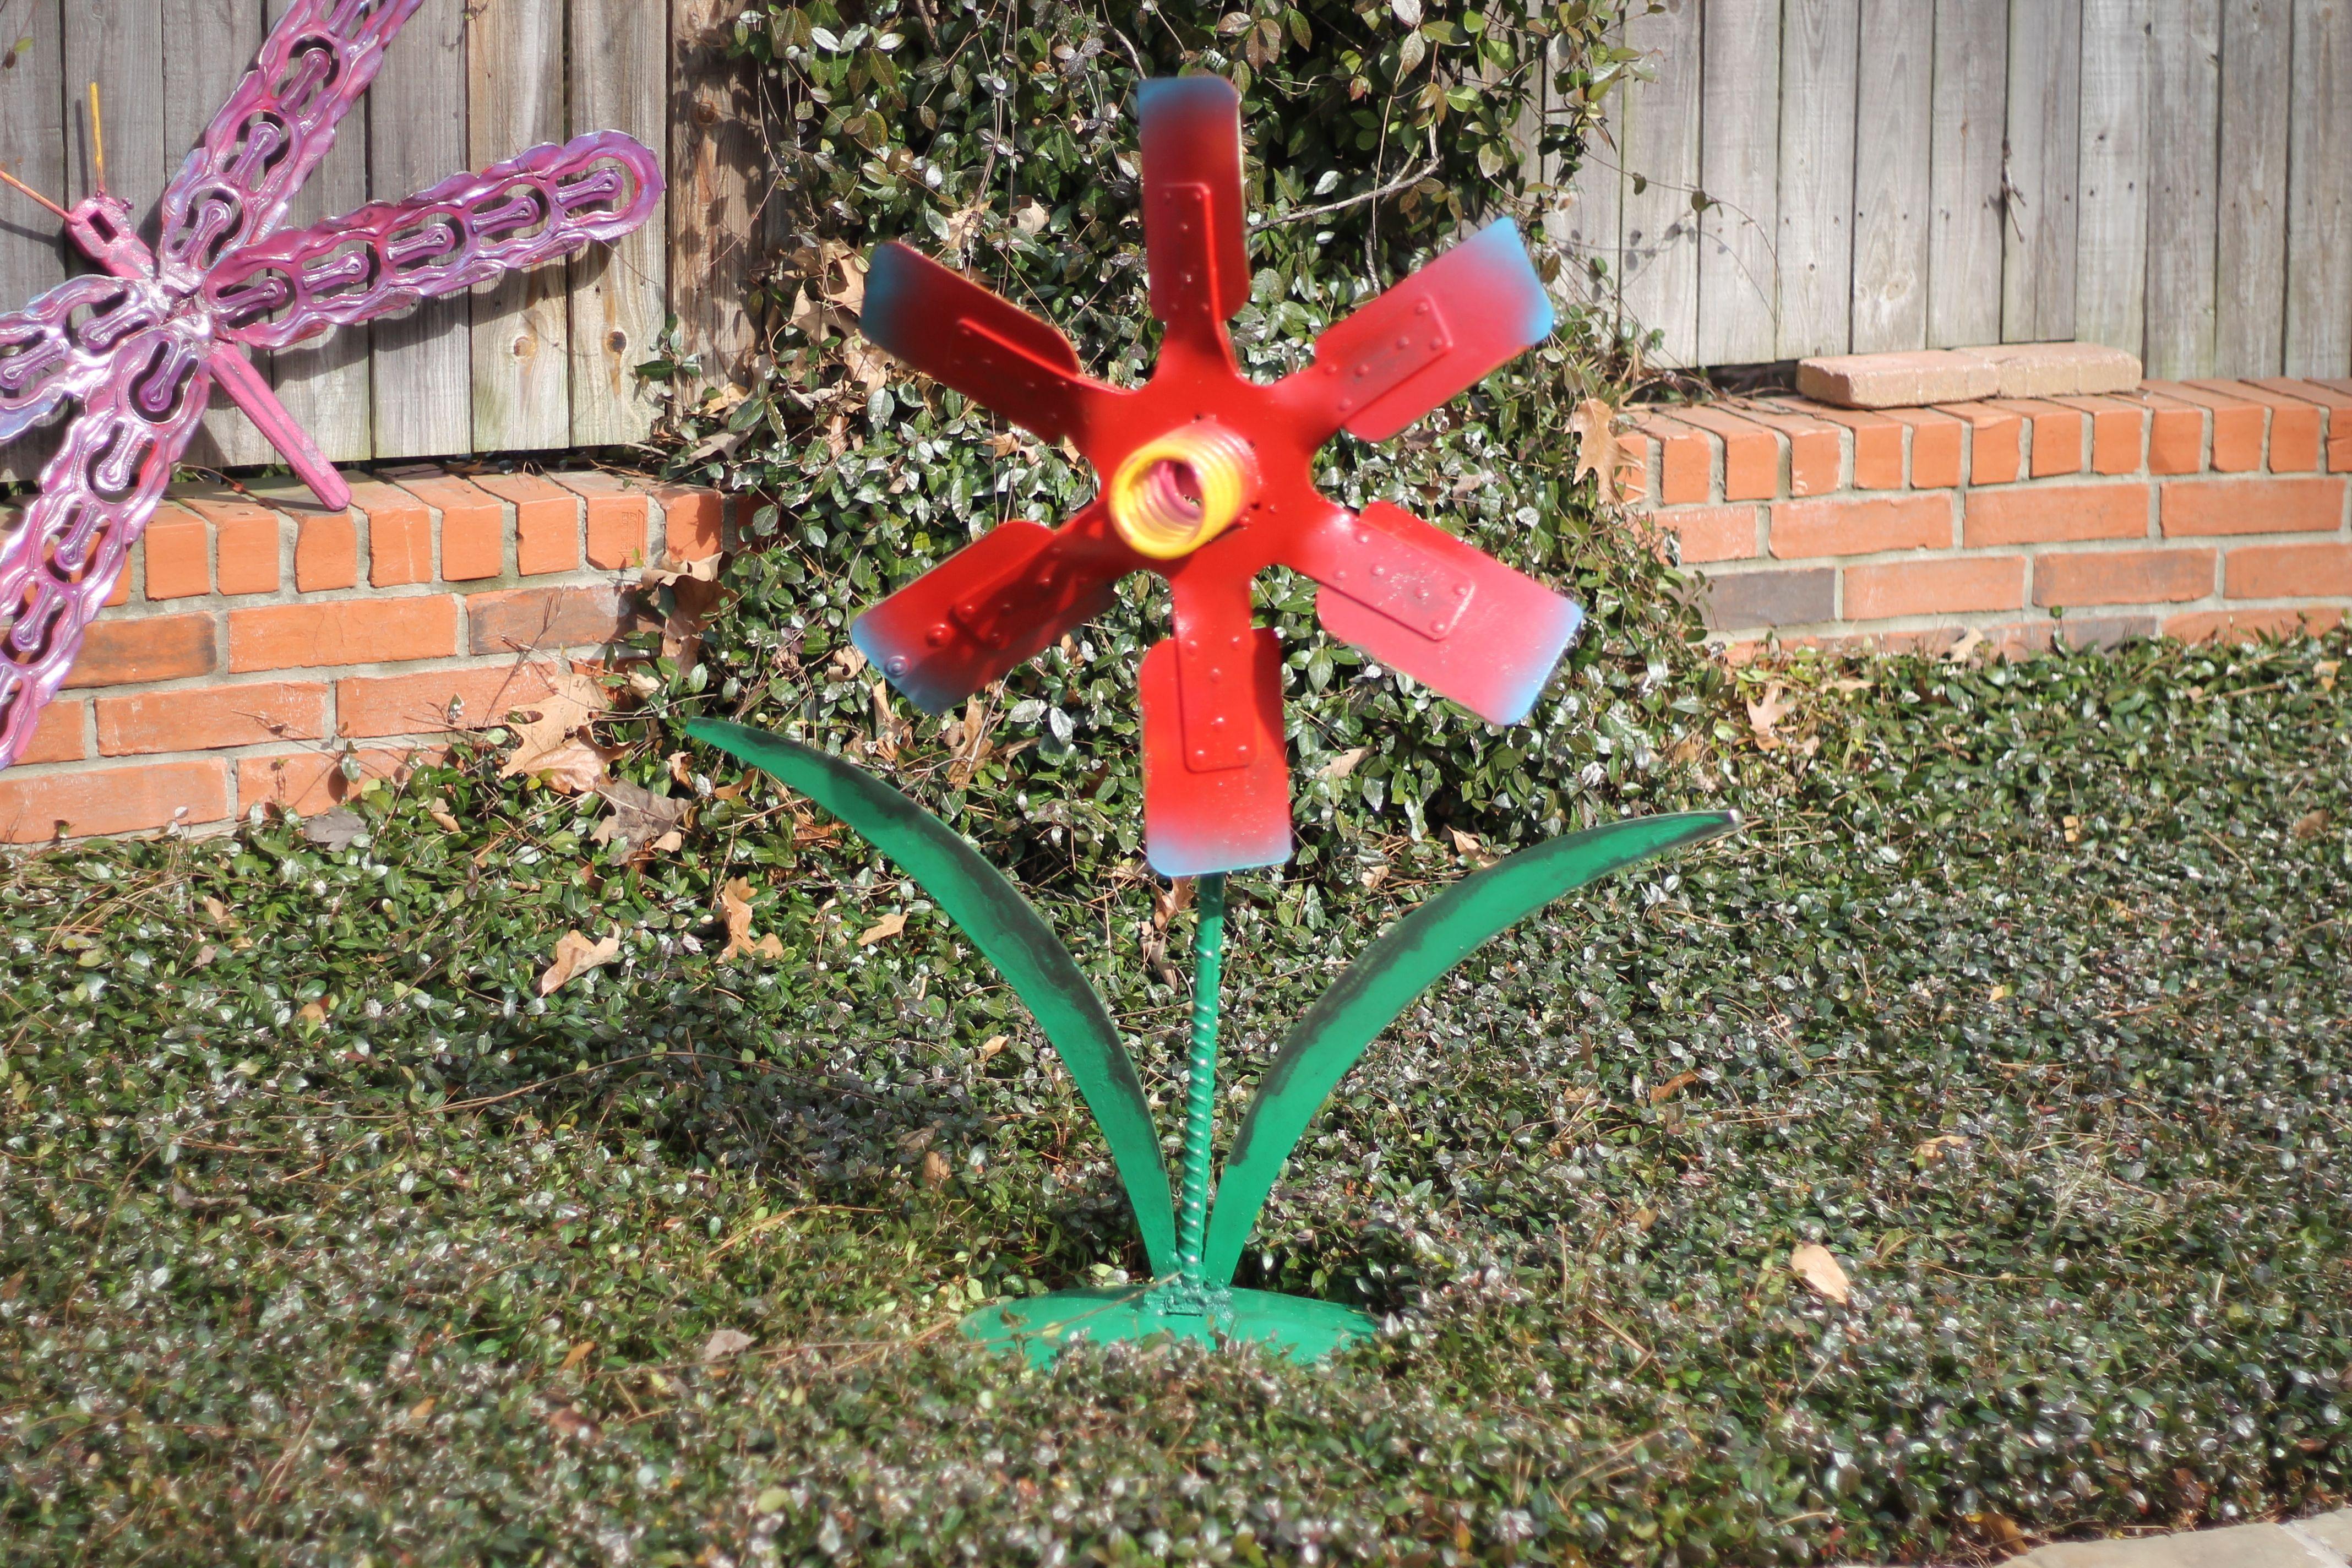 Buy a Hand Crafted Metal Statue, Sculpture Artwork Garden ... on Backyard Metal Art id=99458